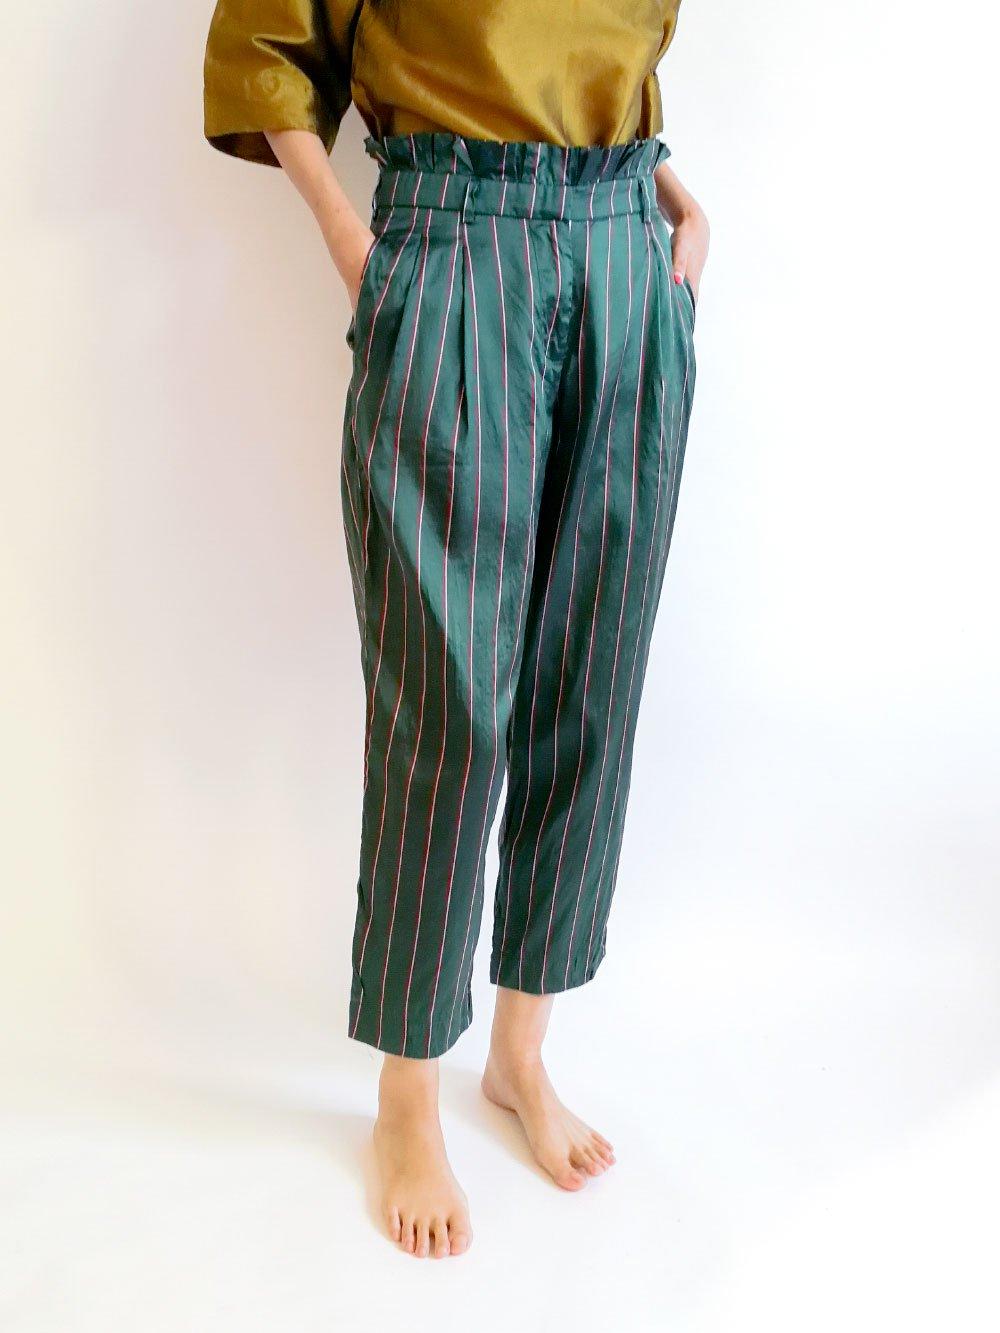 Tucked Pants / dark green